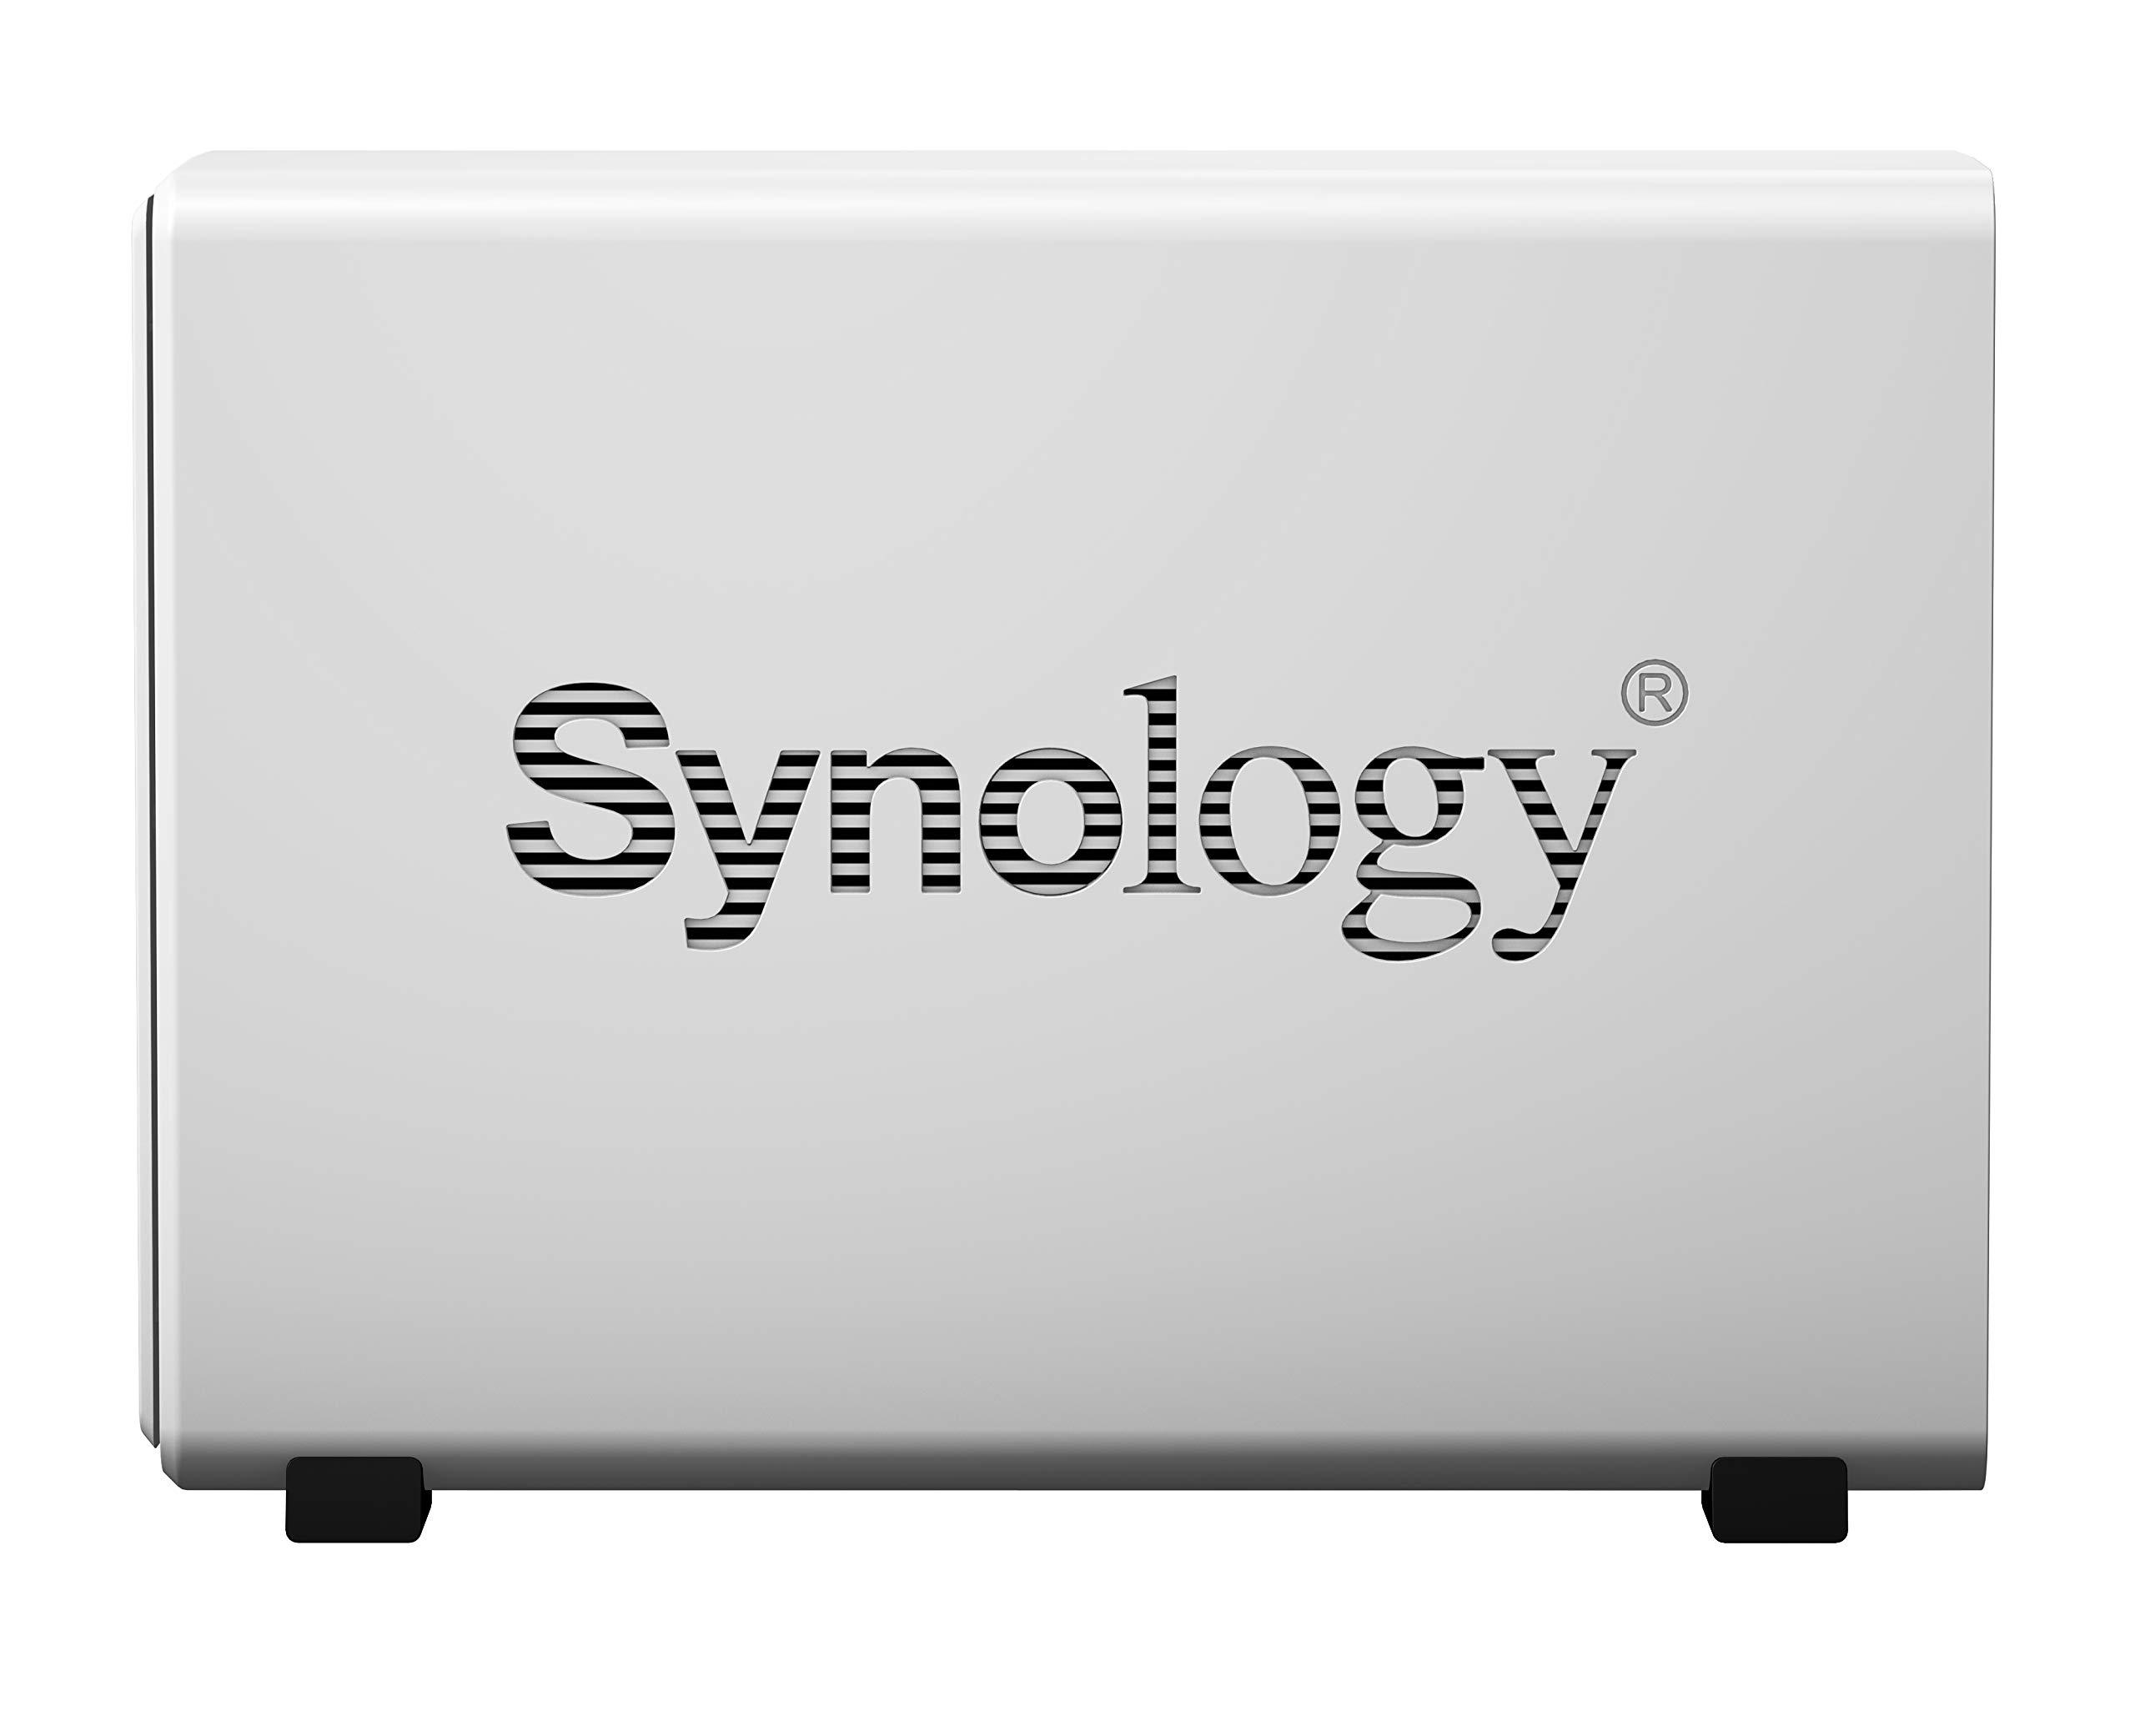 Synology 1 Bay NAS DiskStation (DS119j), 1-Bay; 256MB DDR3L by Synology (Image #5)